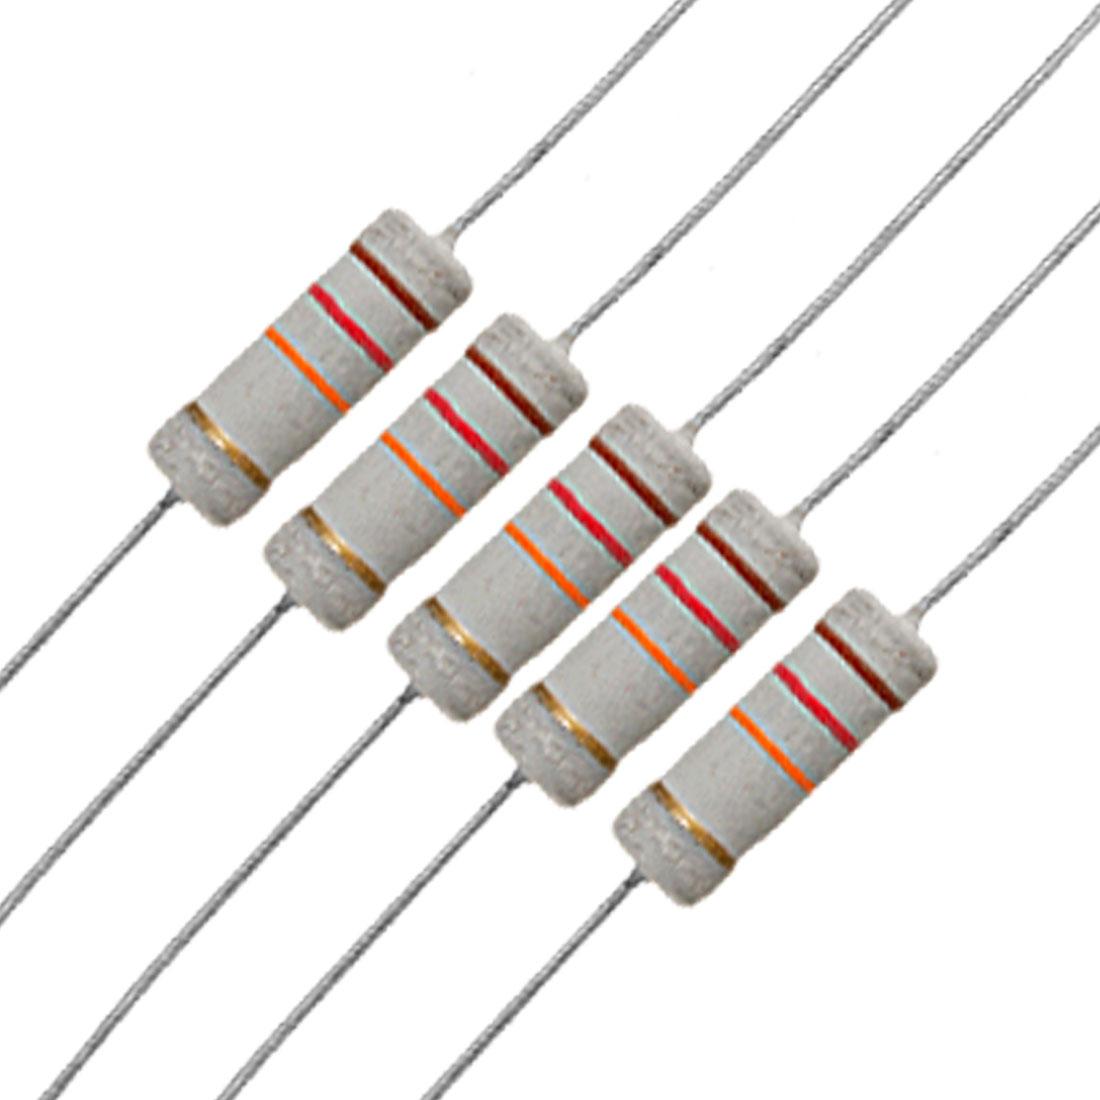 10 x 3W 500V 12K ohm 12KR Metal Oxide Film Resistors